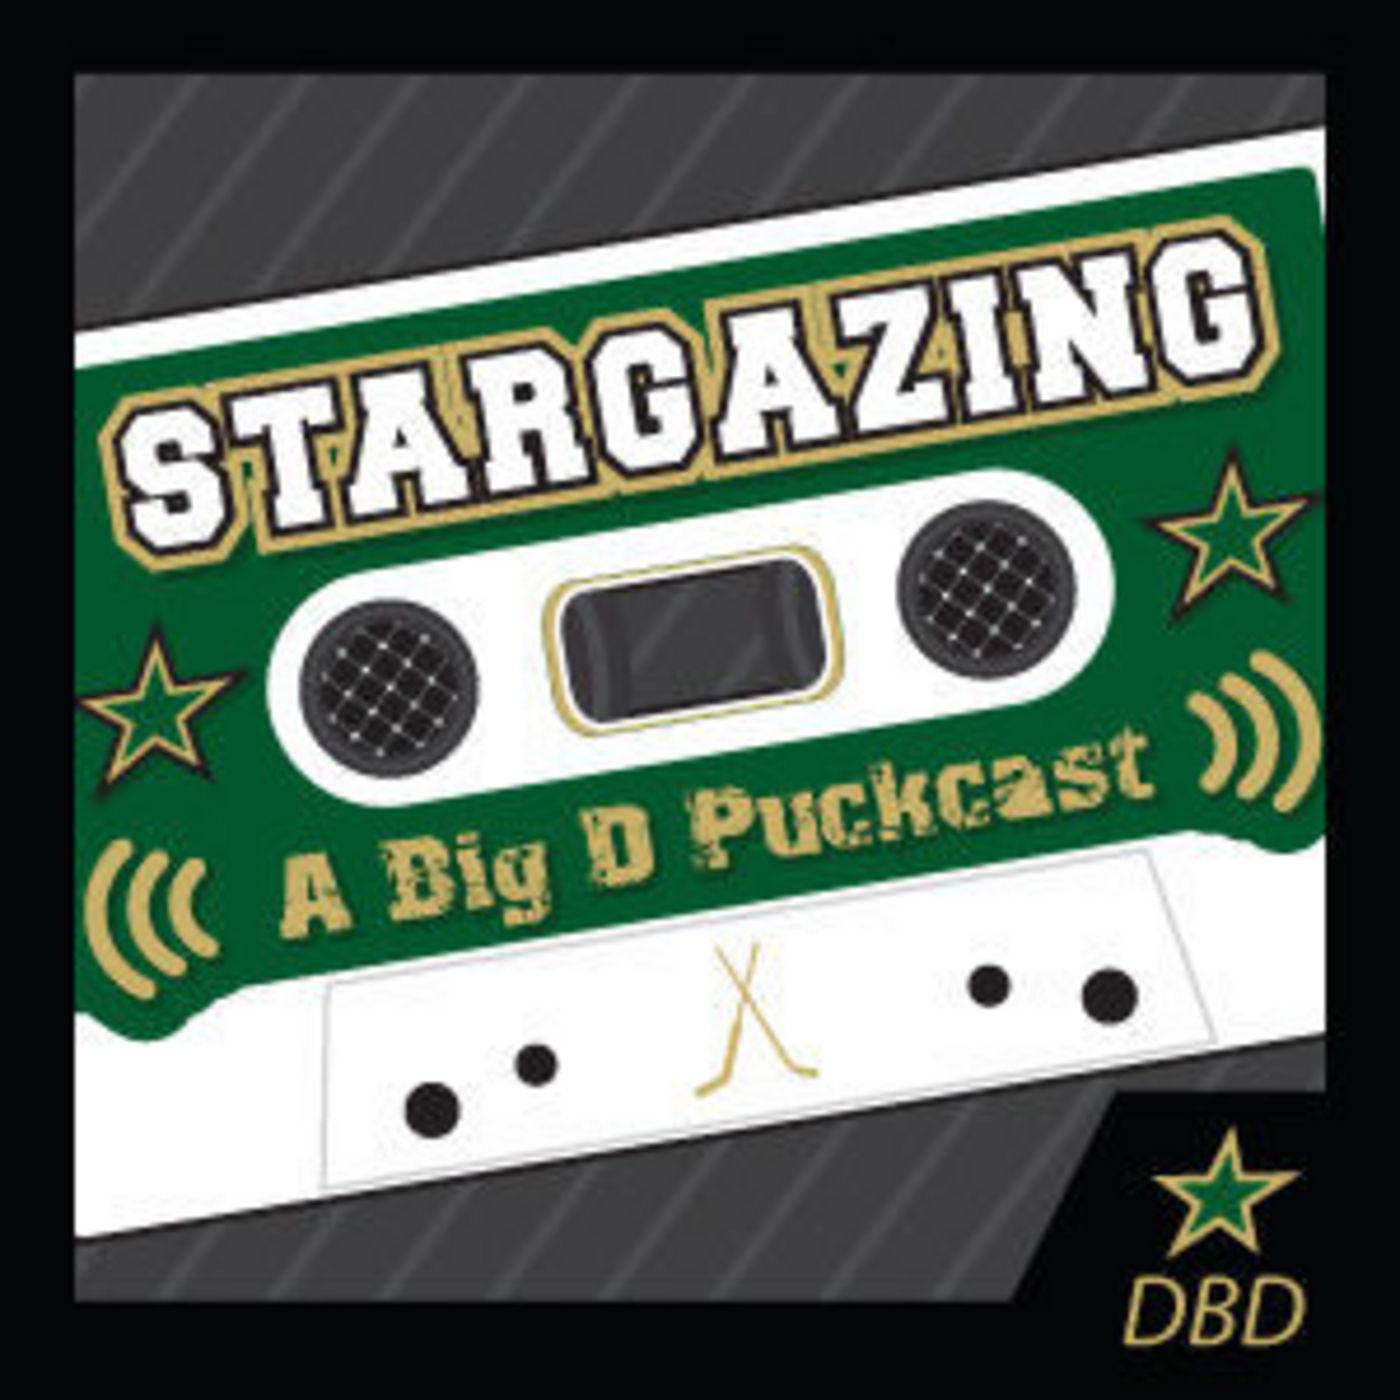 <![CDATA[Stargazing: A Big D Hockey Puckcast]]>